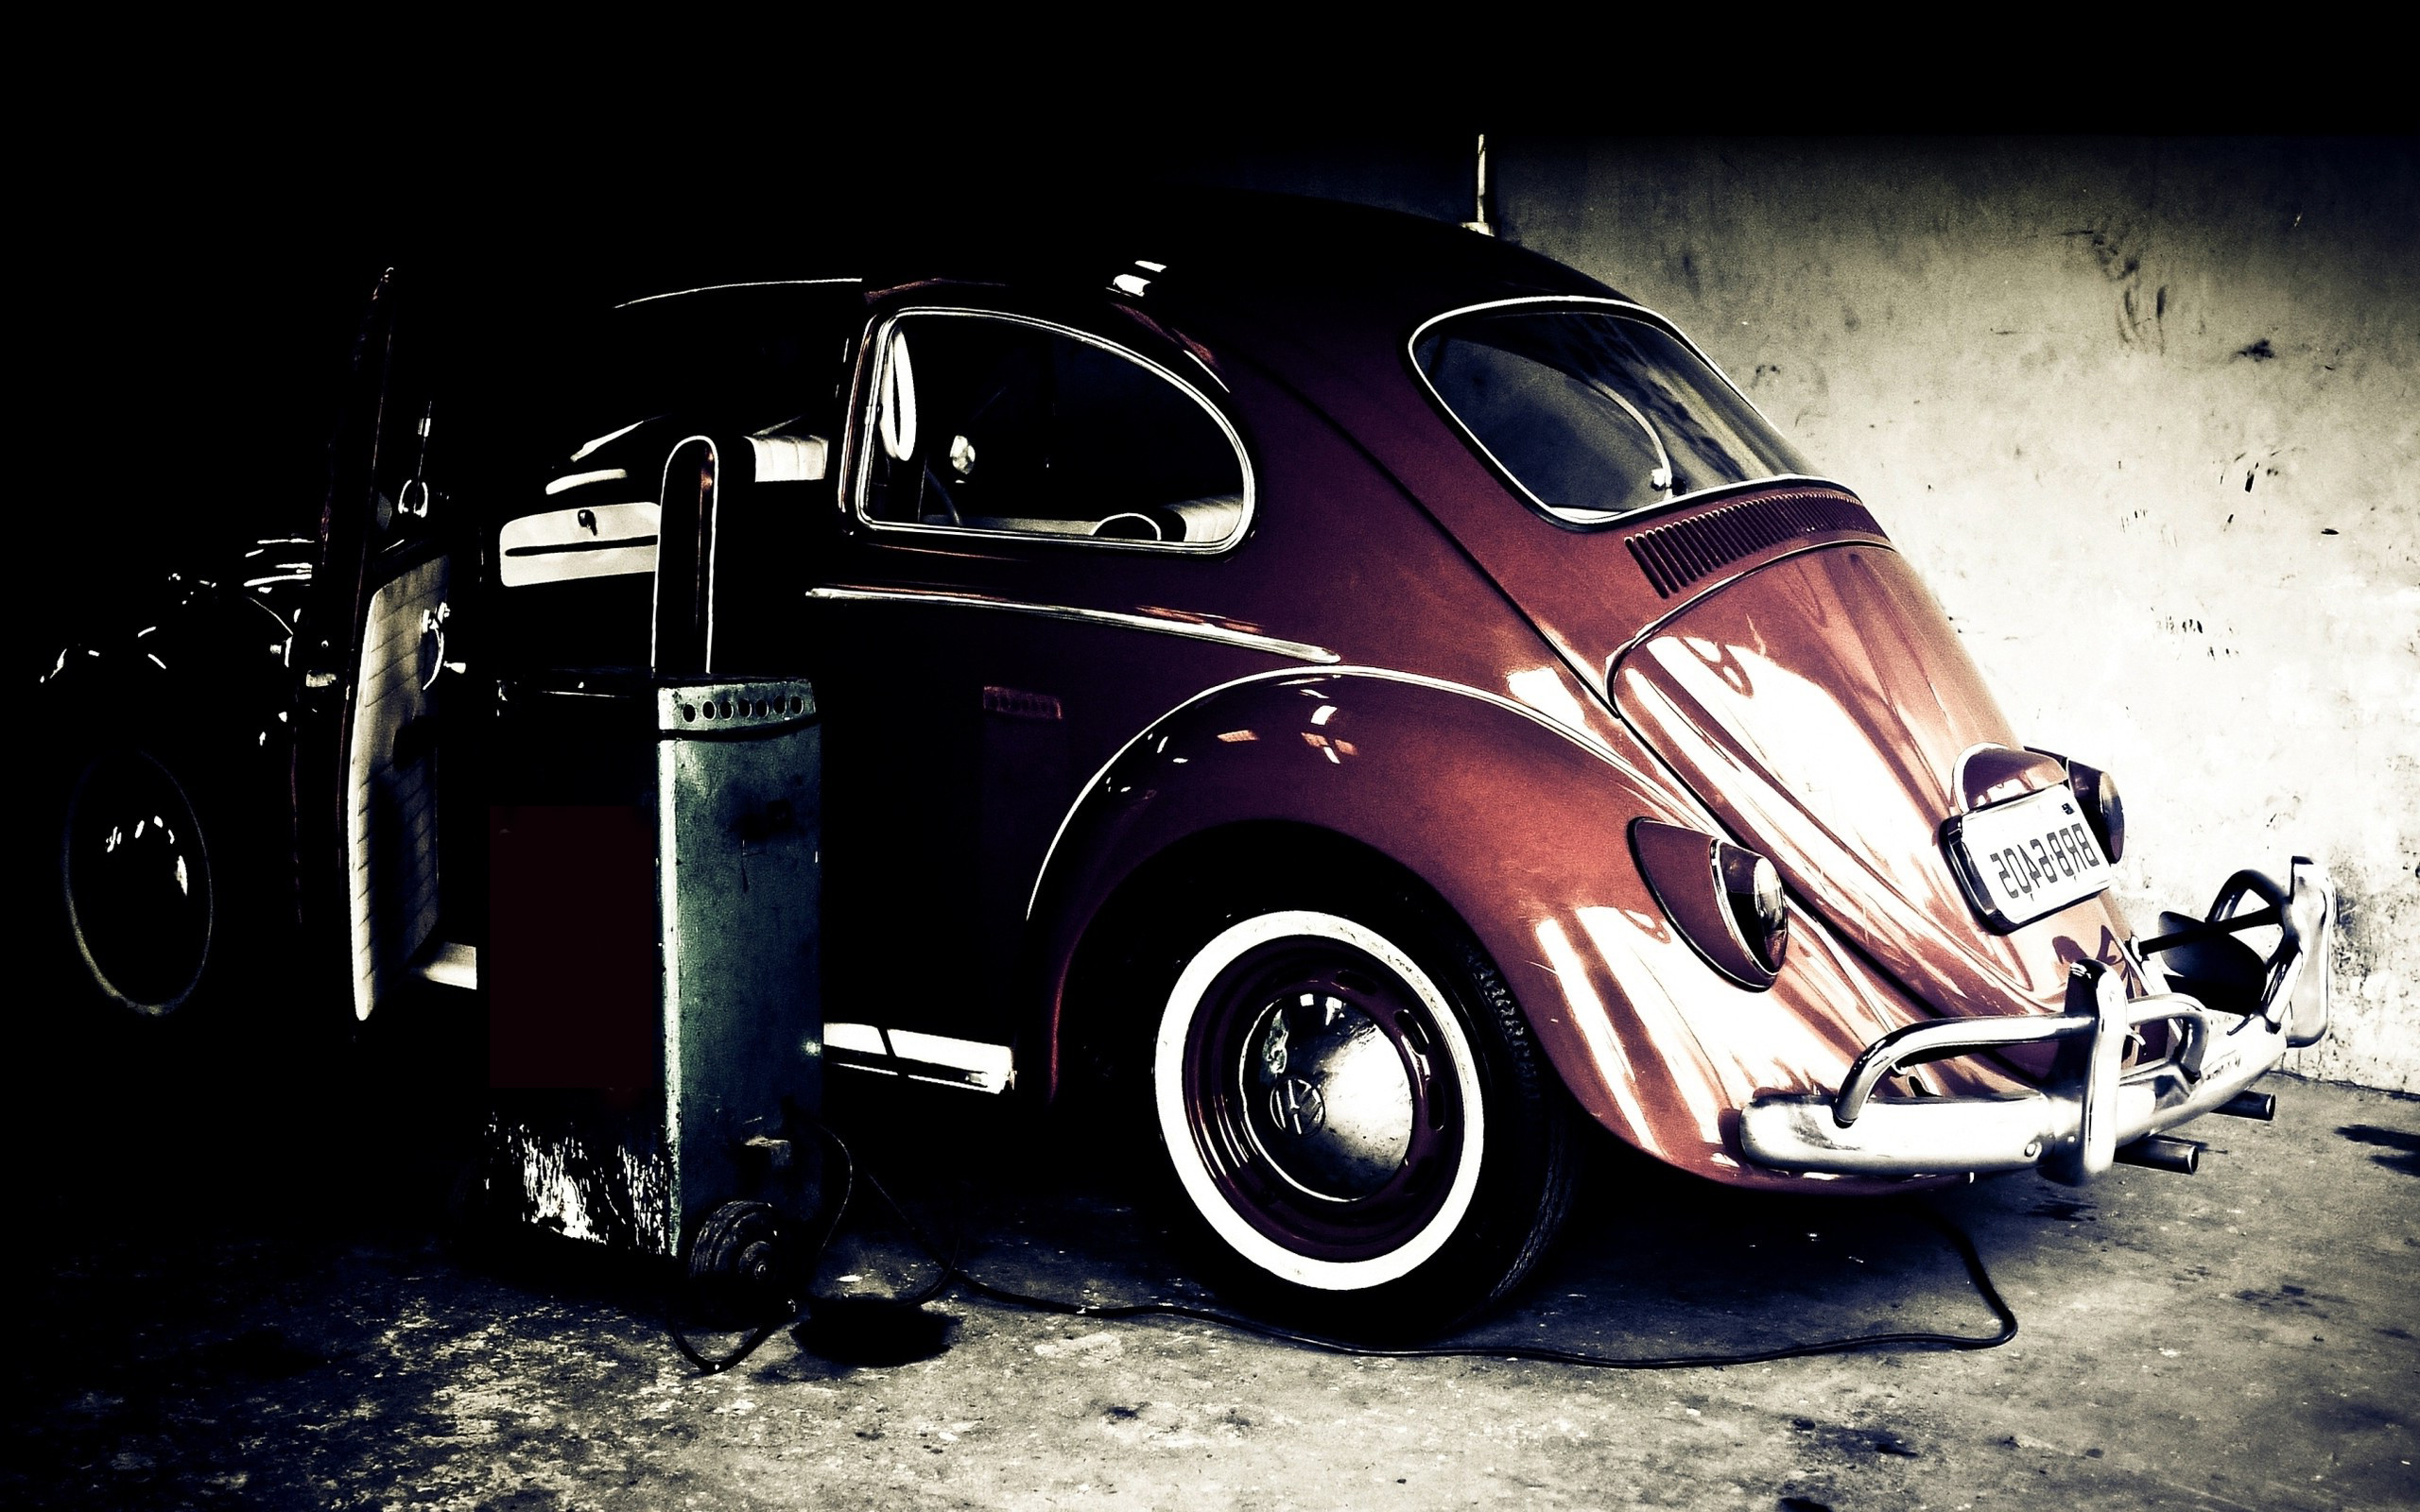 vw beetle wallpaper hd 72 images